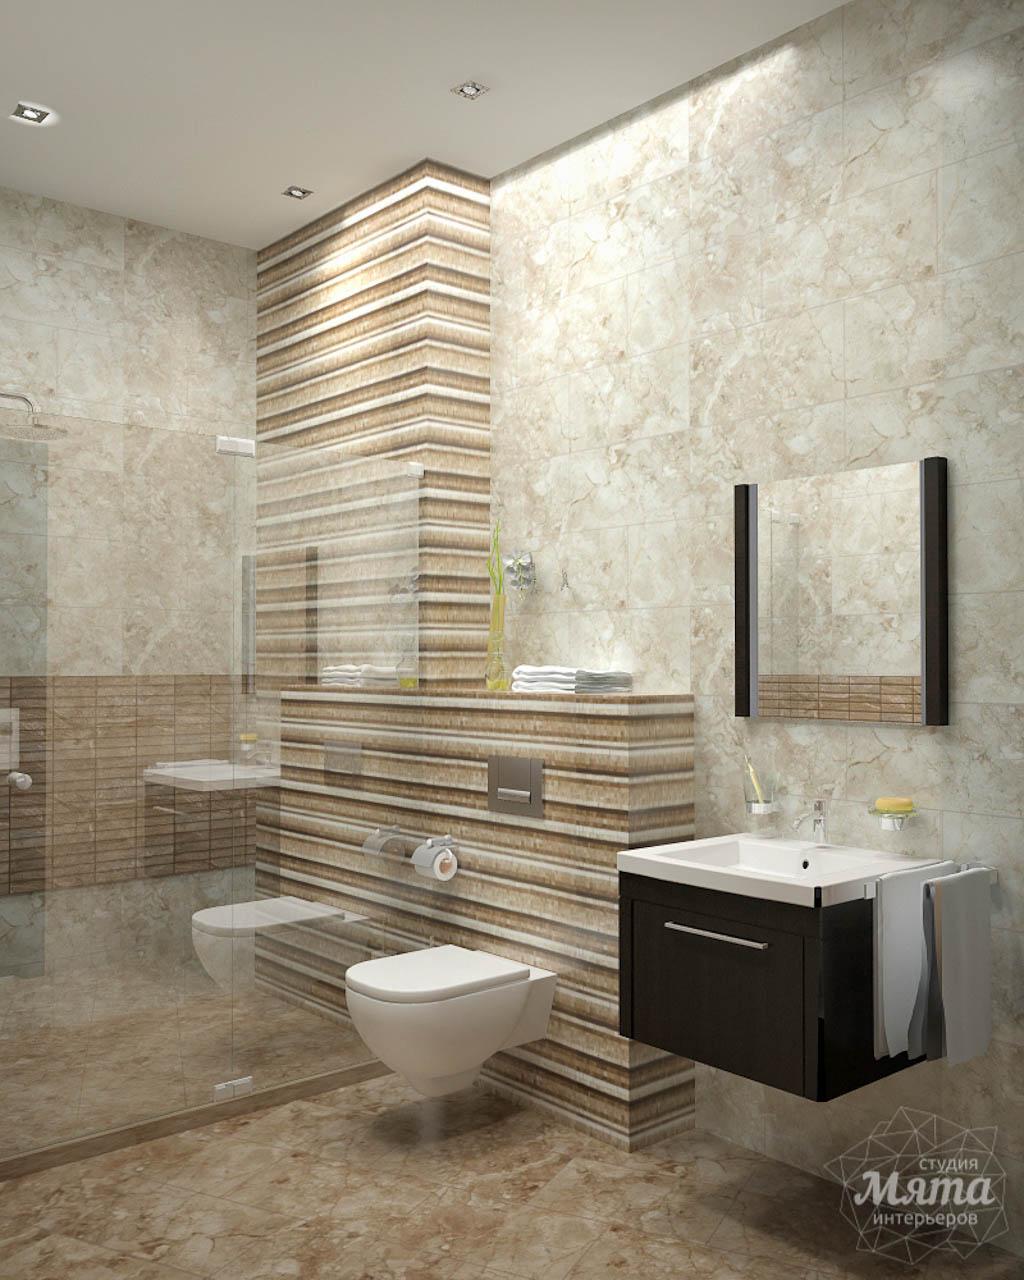 Дизайн проект интерьера коттеджа  в стиле минимализм по ул. Барвинка 15 img1662662921